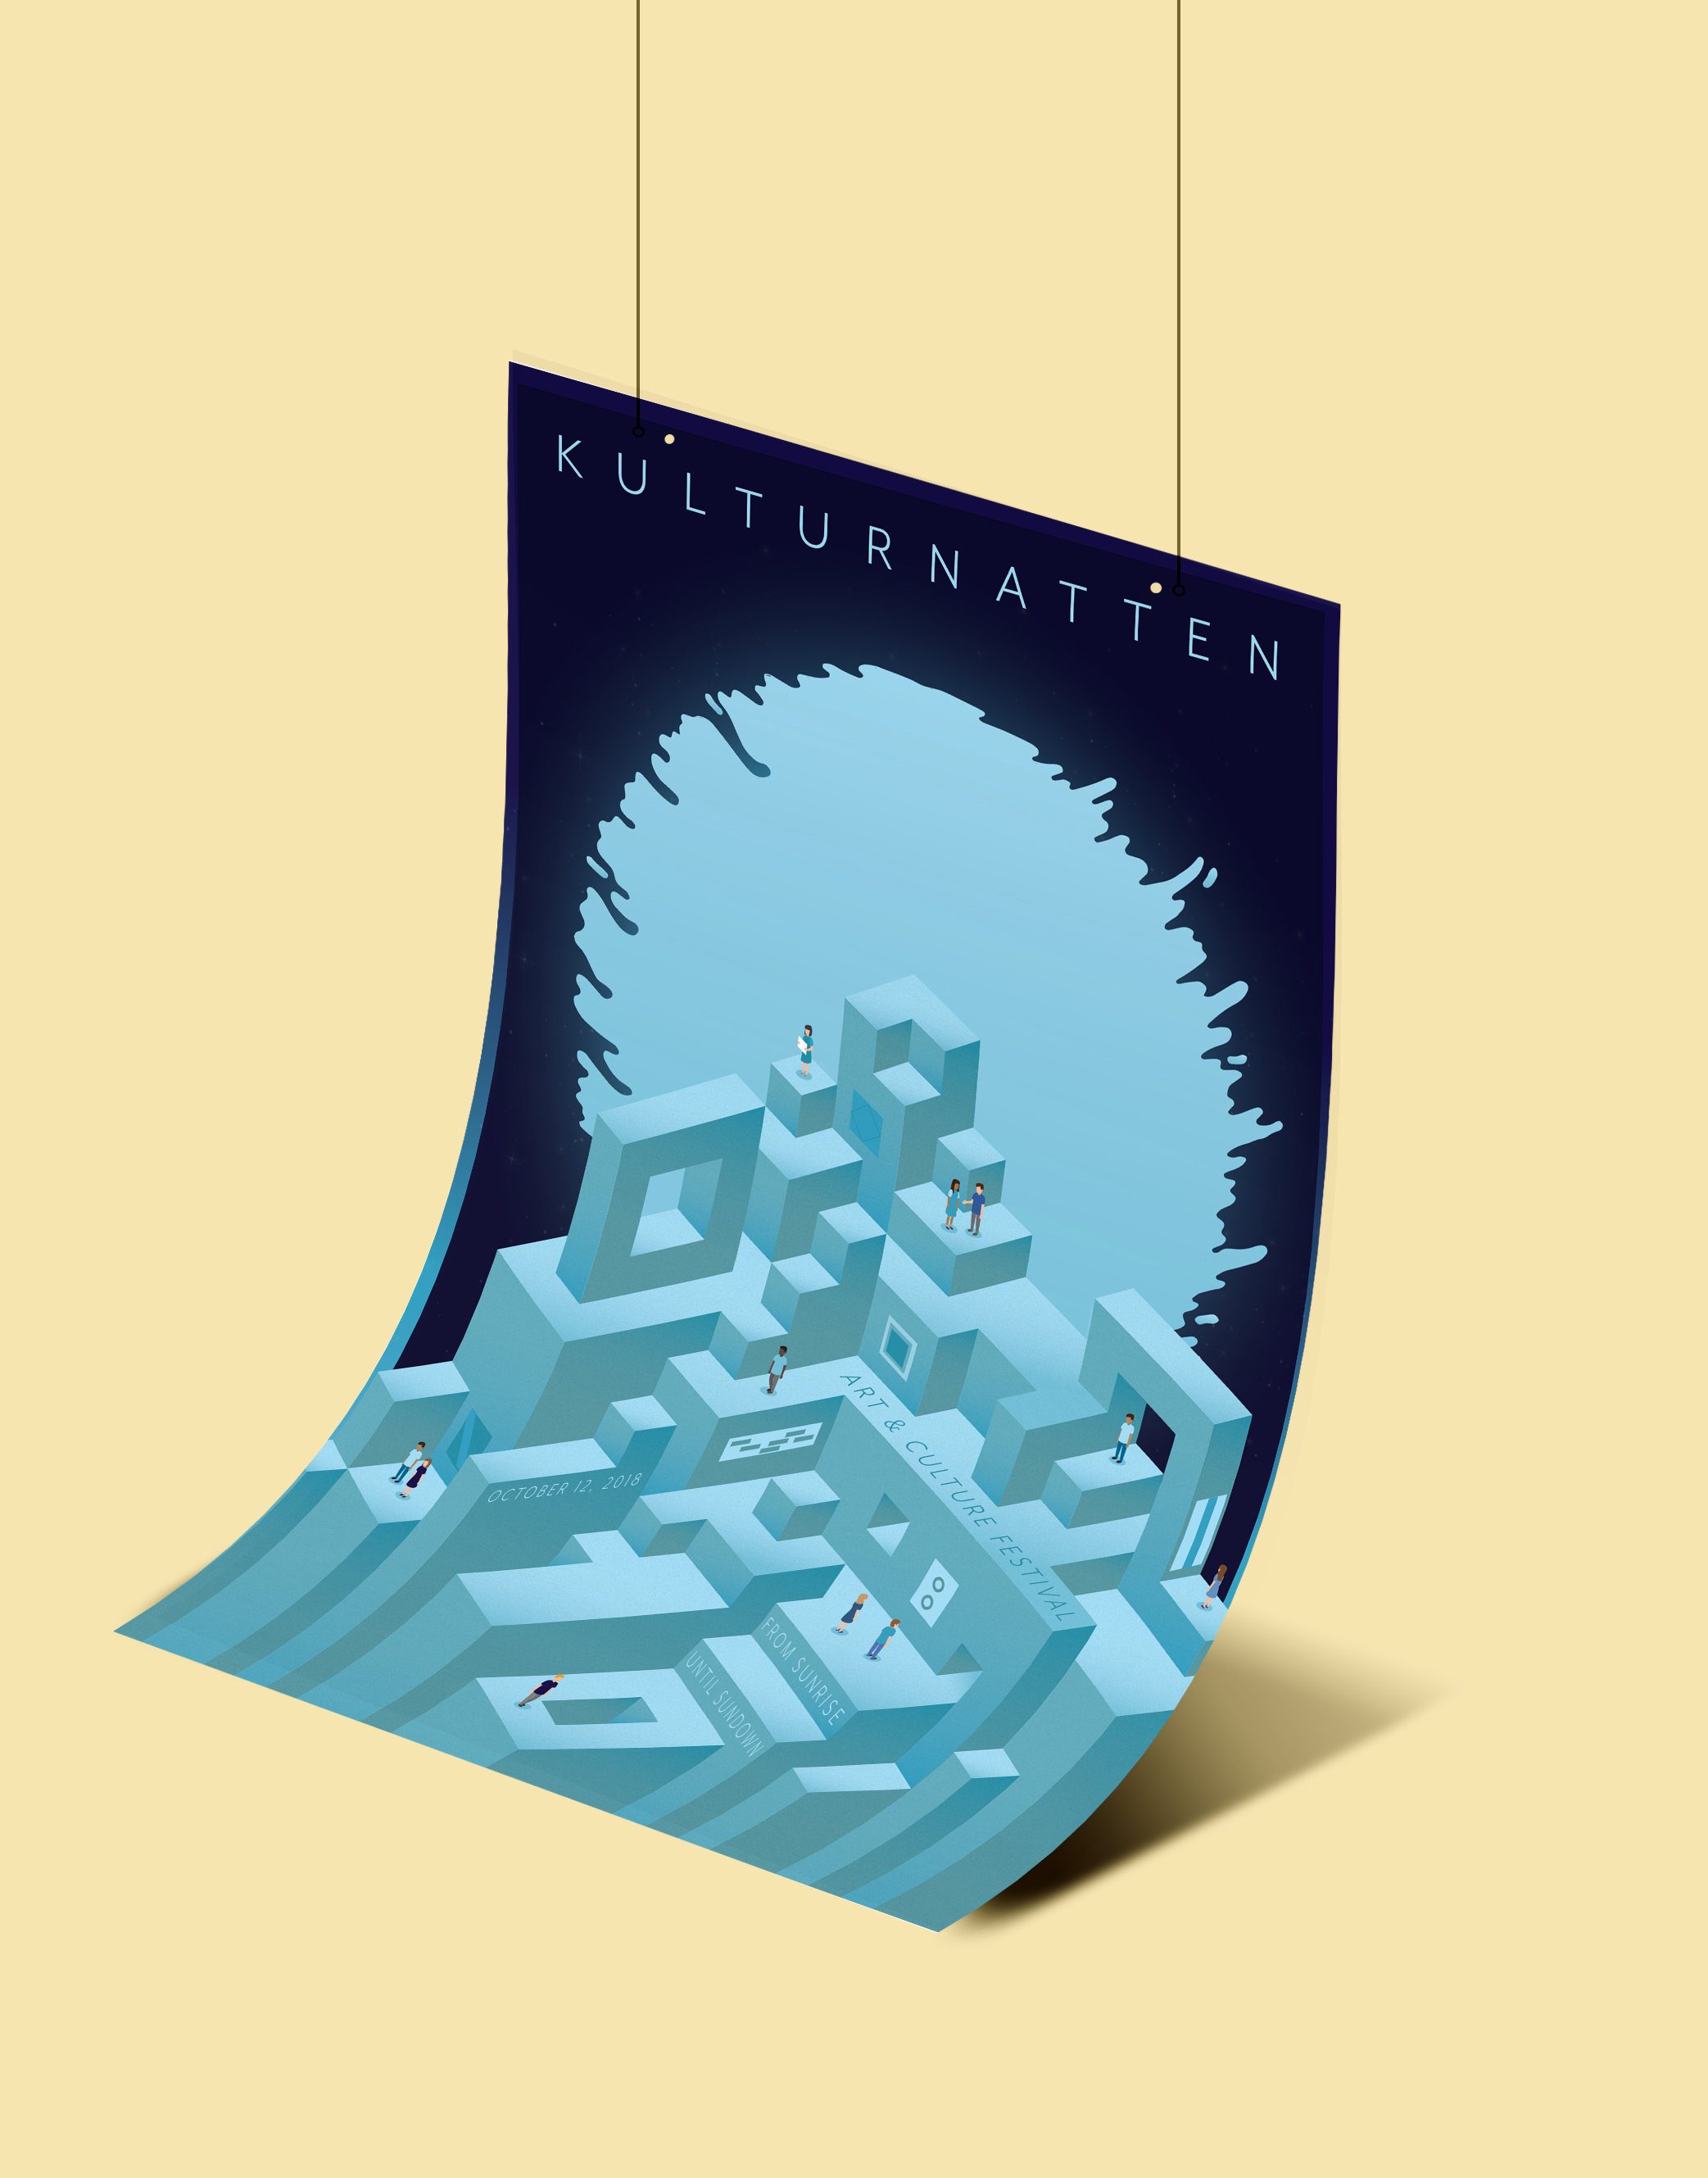 Hanging Poster Mockup PSD For Branding & Presentation copy.jpg